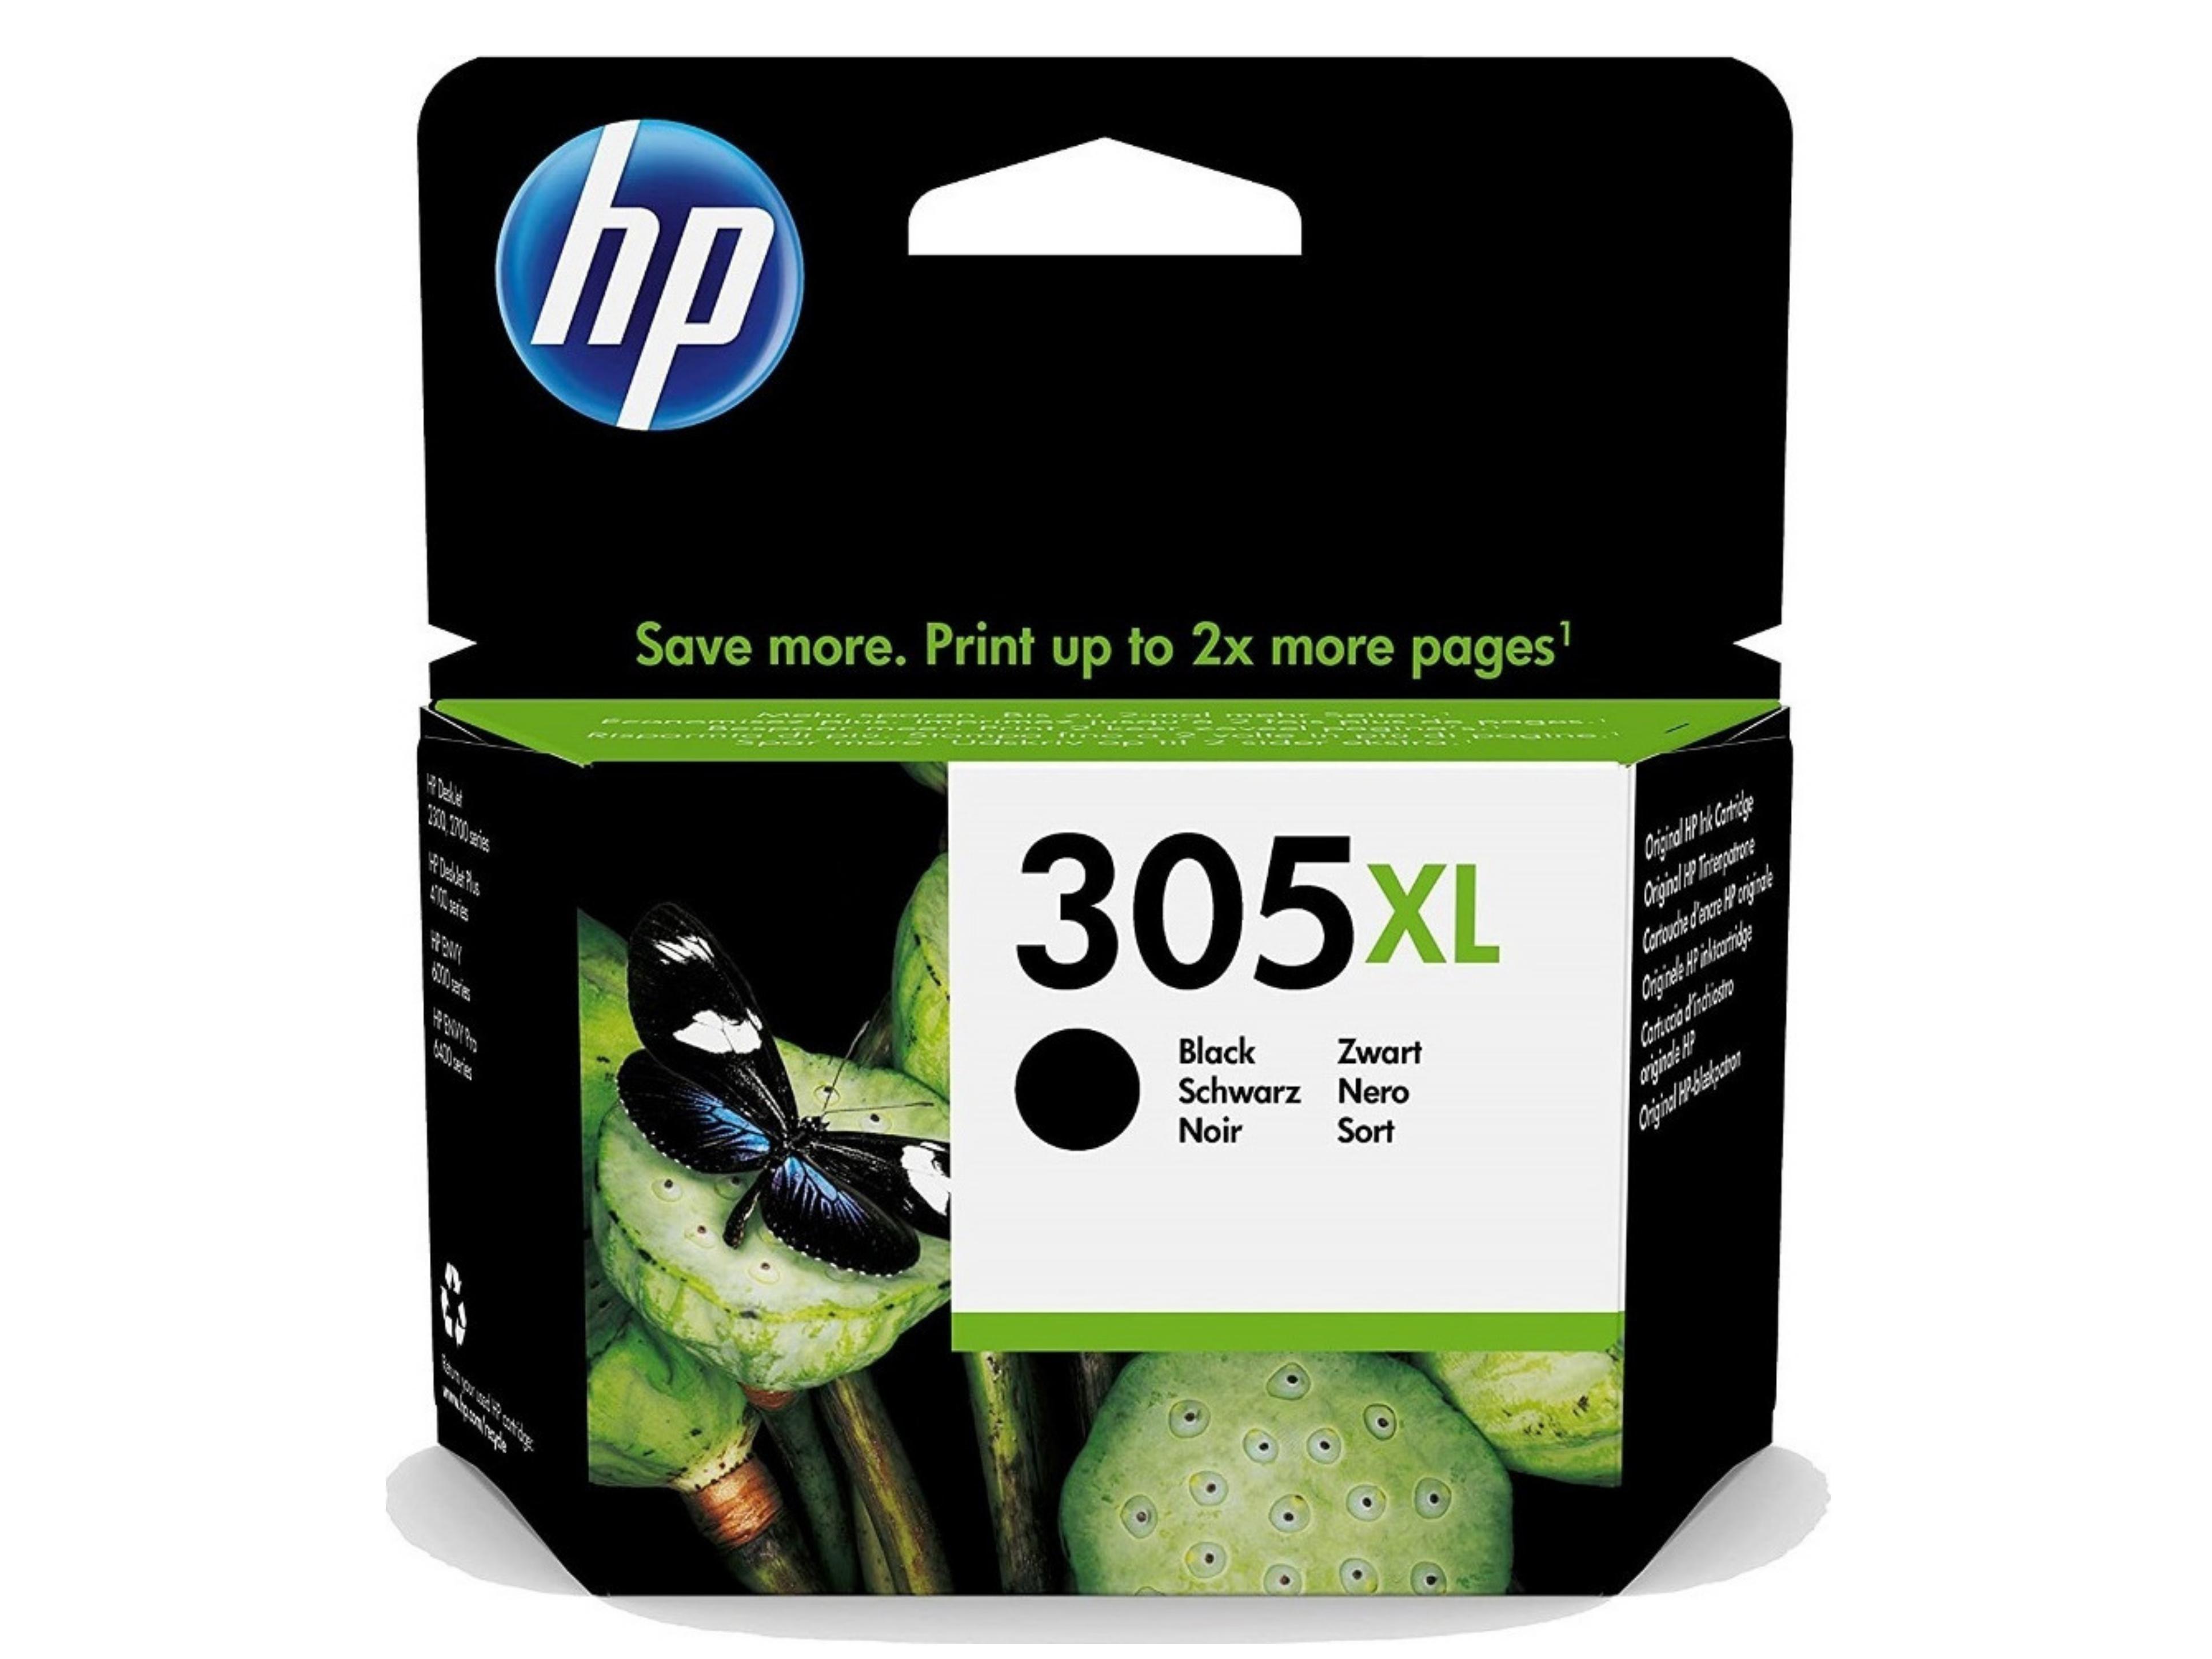 HP 305XL Black Μελάνι Εκτυπωτή InkJet Μαύρο (3YM62AE)